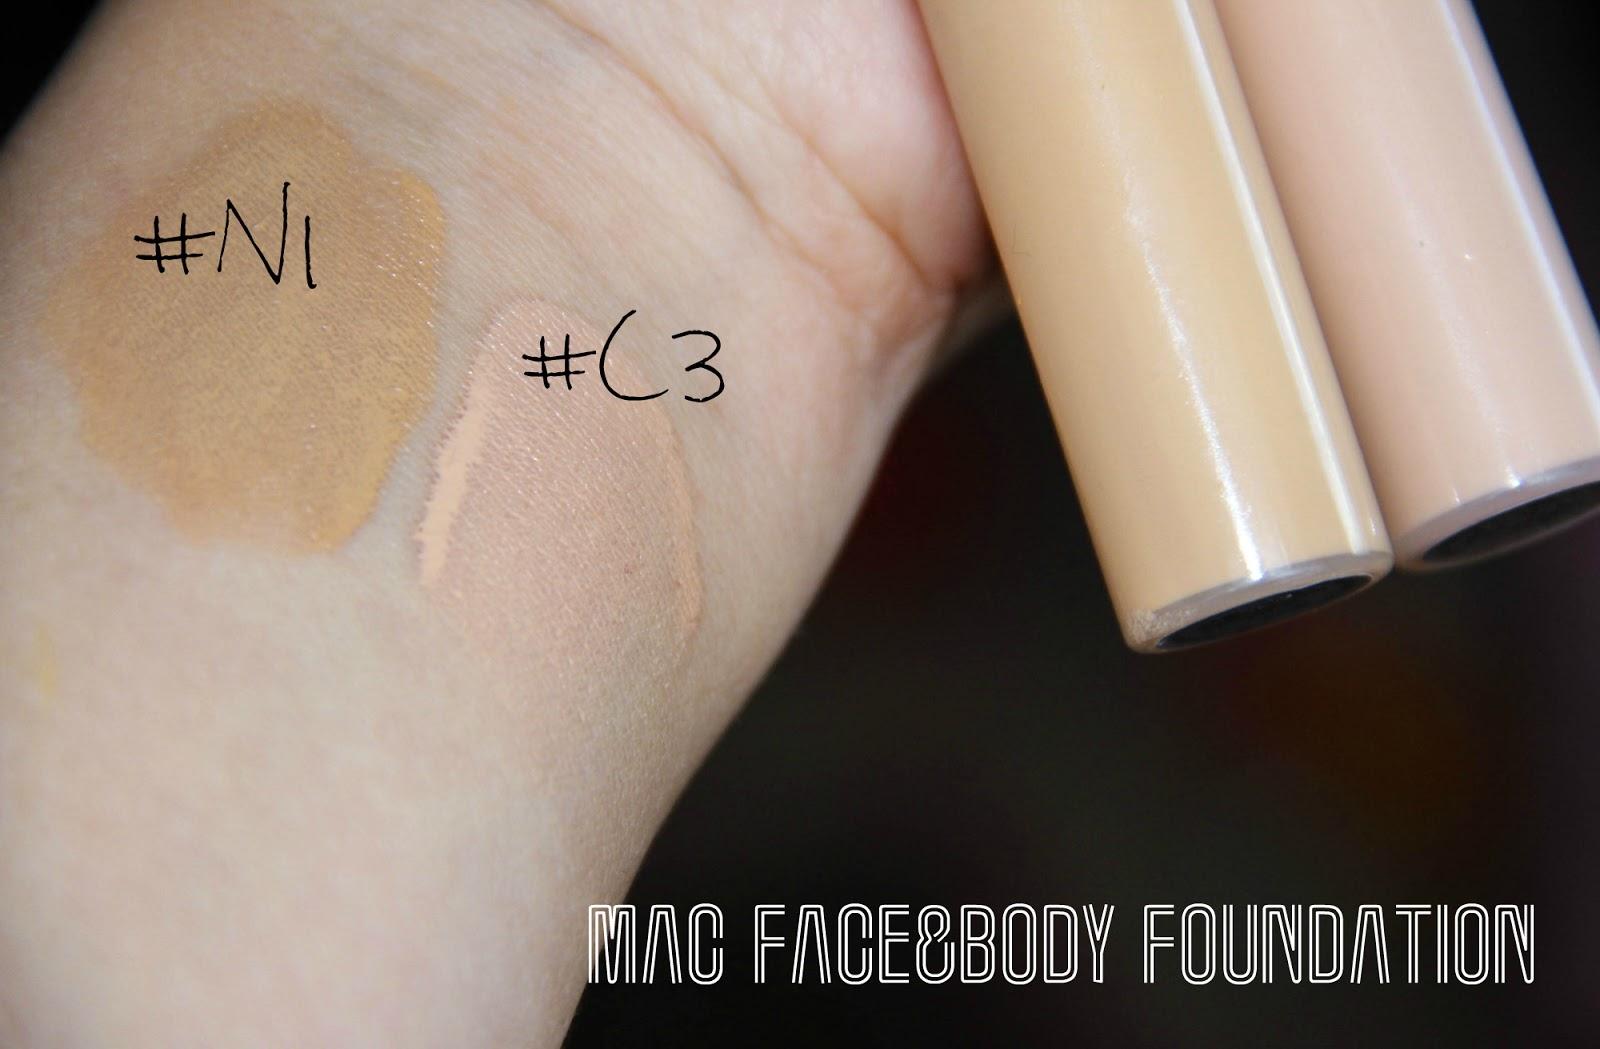 mac face body foundation n1 c3 juliadecember